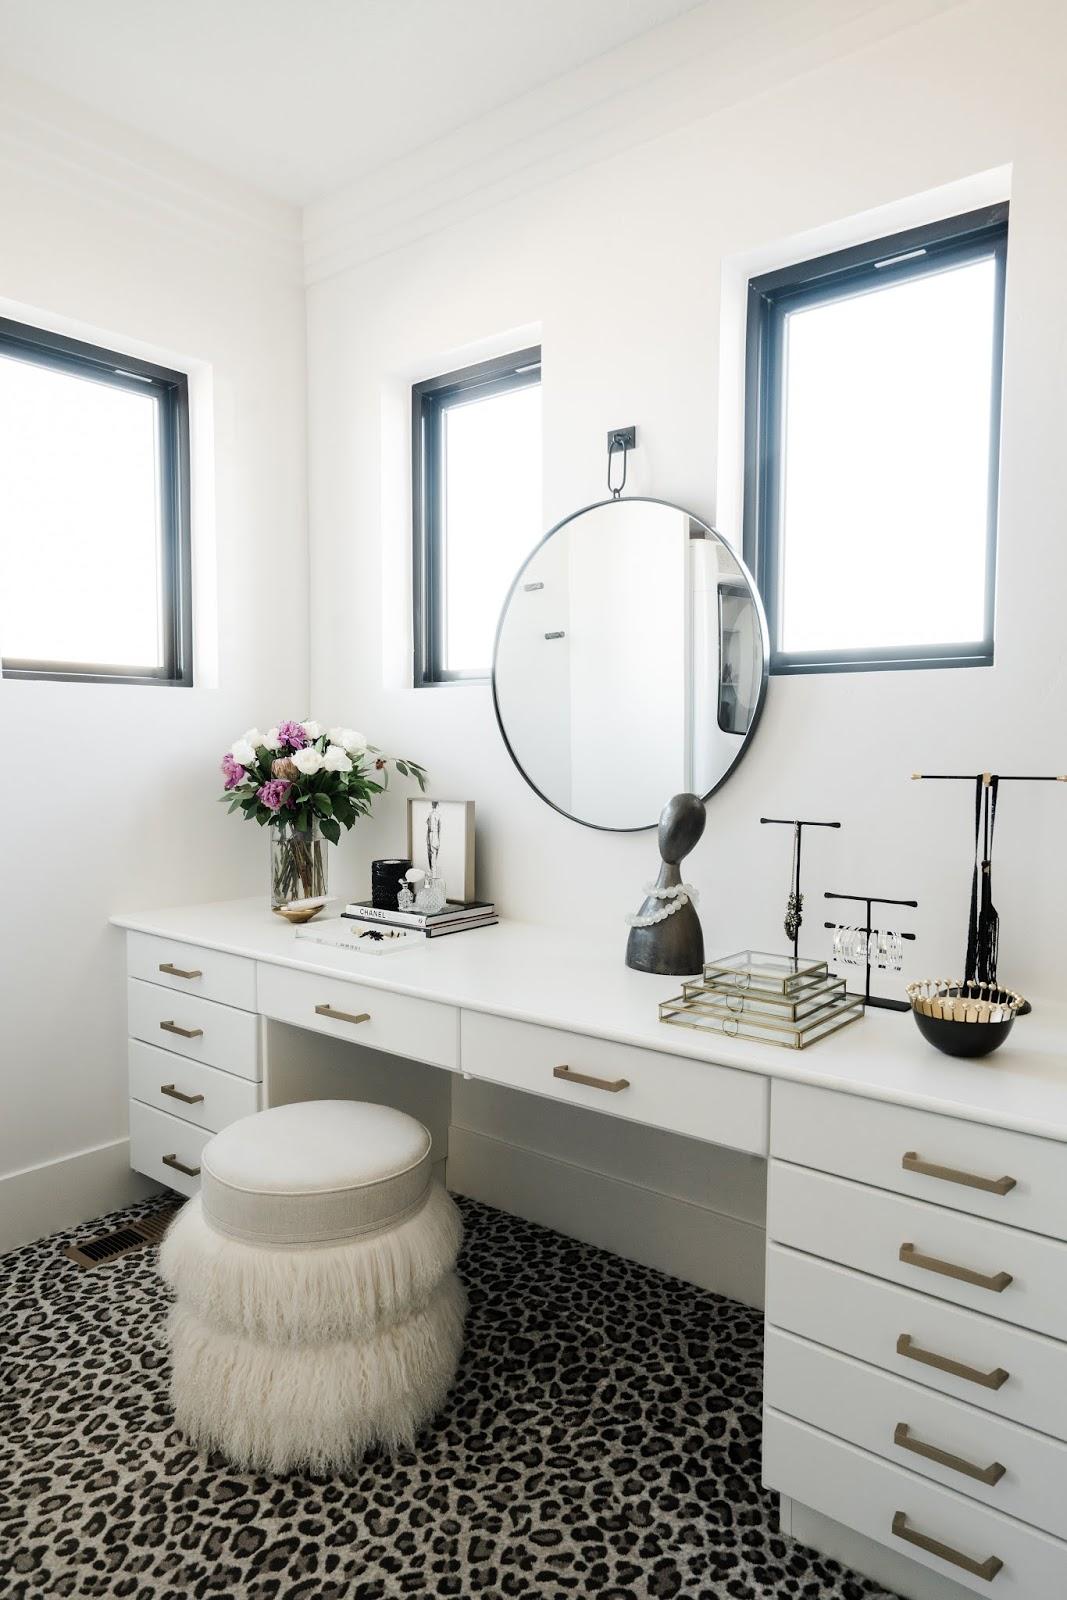 Vanity, Fur Pouf, Leopard Print Carpet